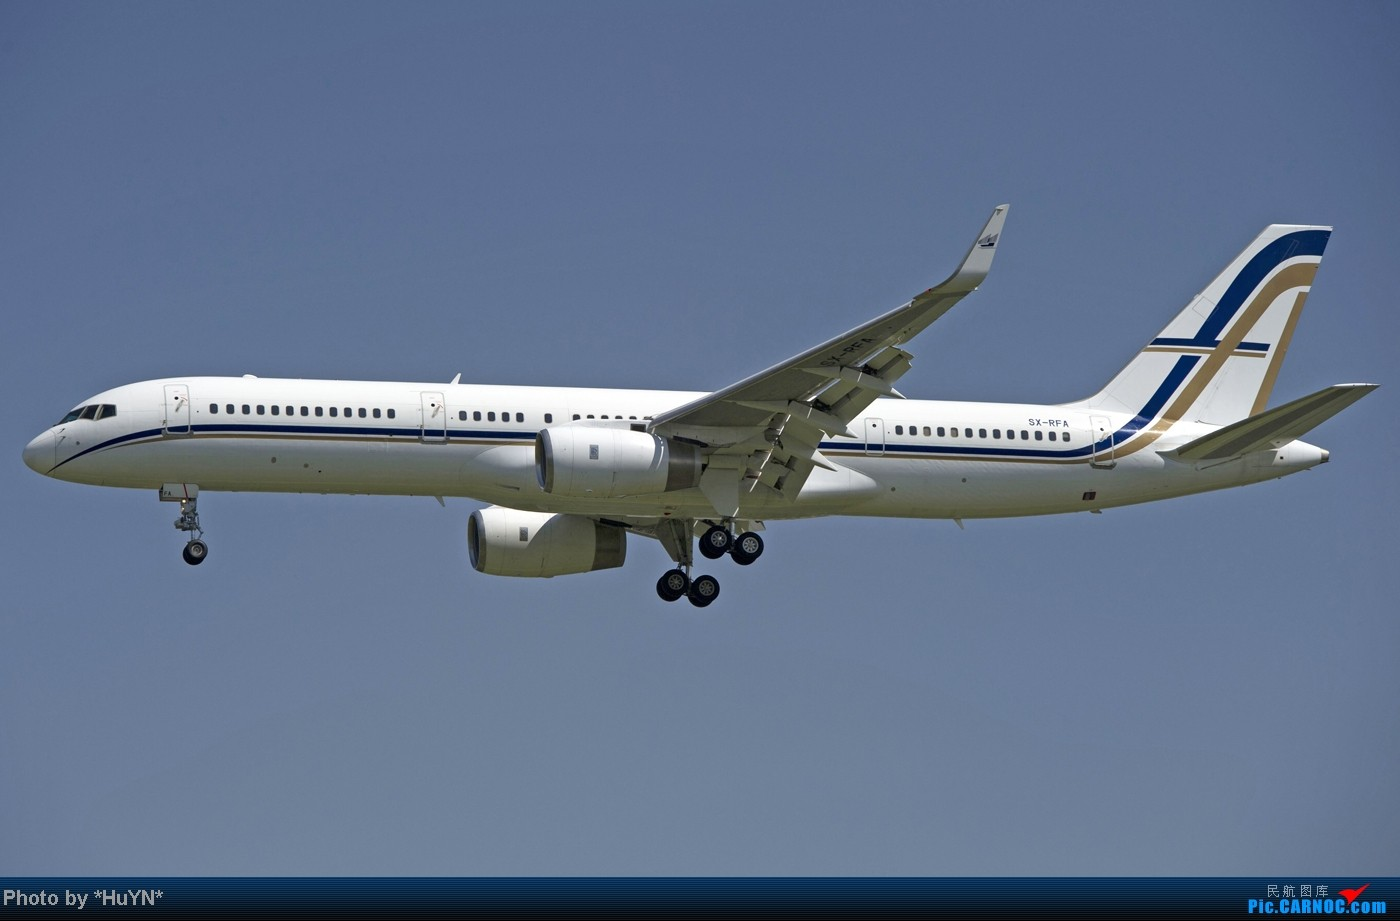 Re:[原创]存货一组 BOEING 757-200 SX-RFA 中国北京首都国际机场